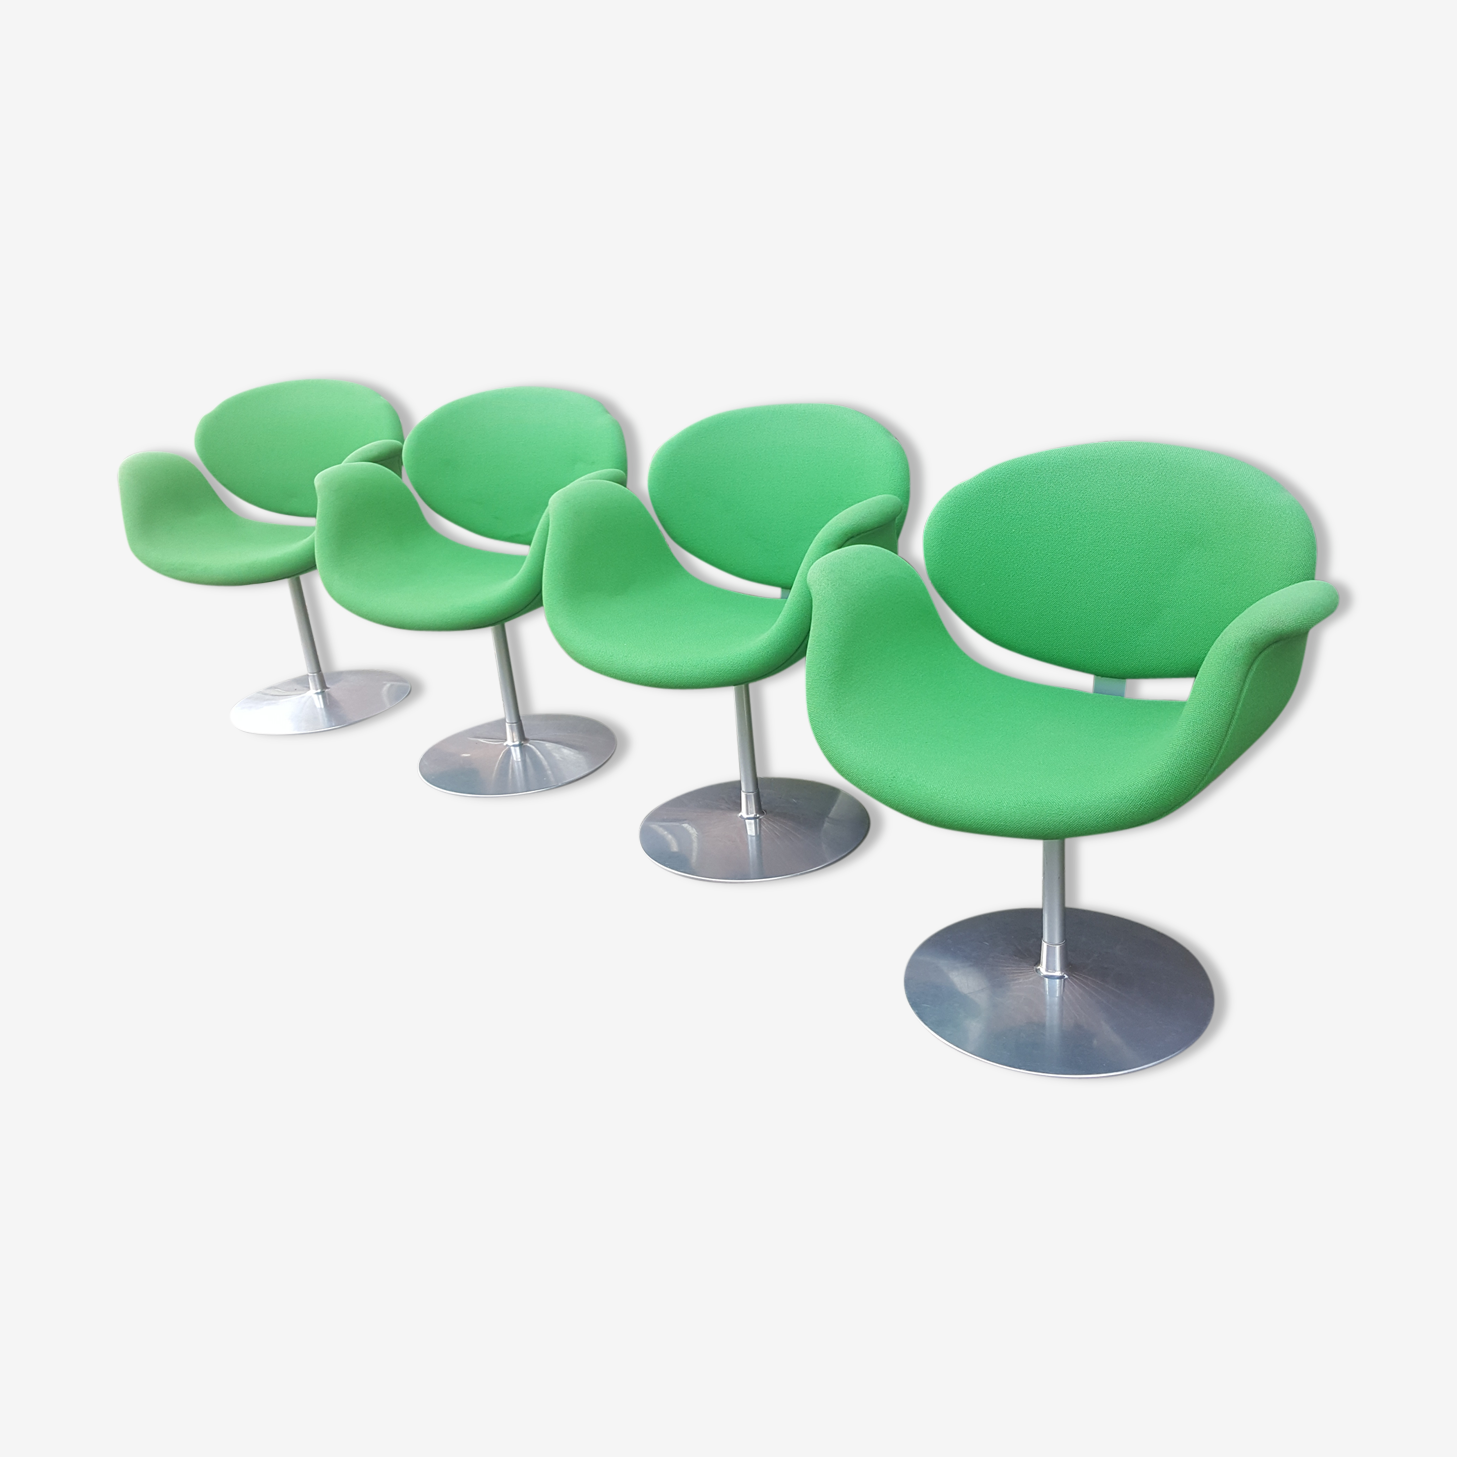 Lot of 4 Pierre Paulin Tulip Chair